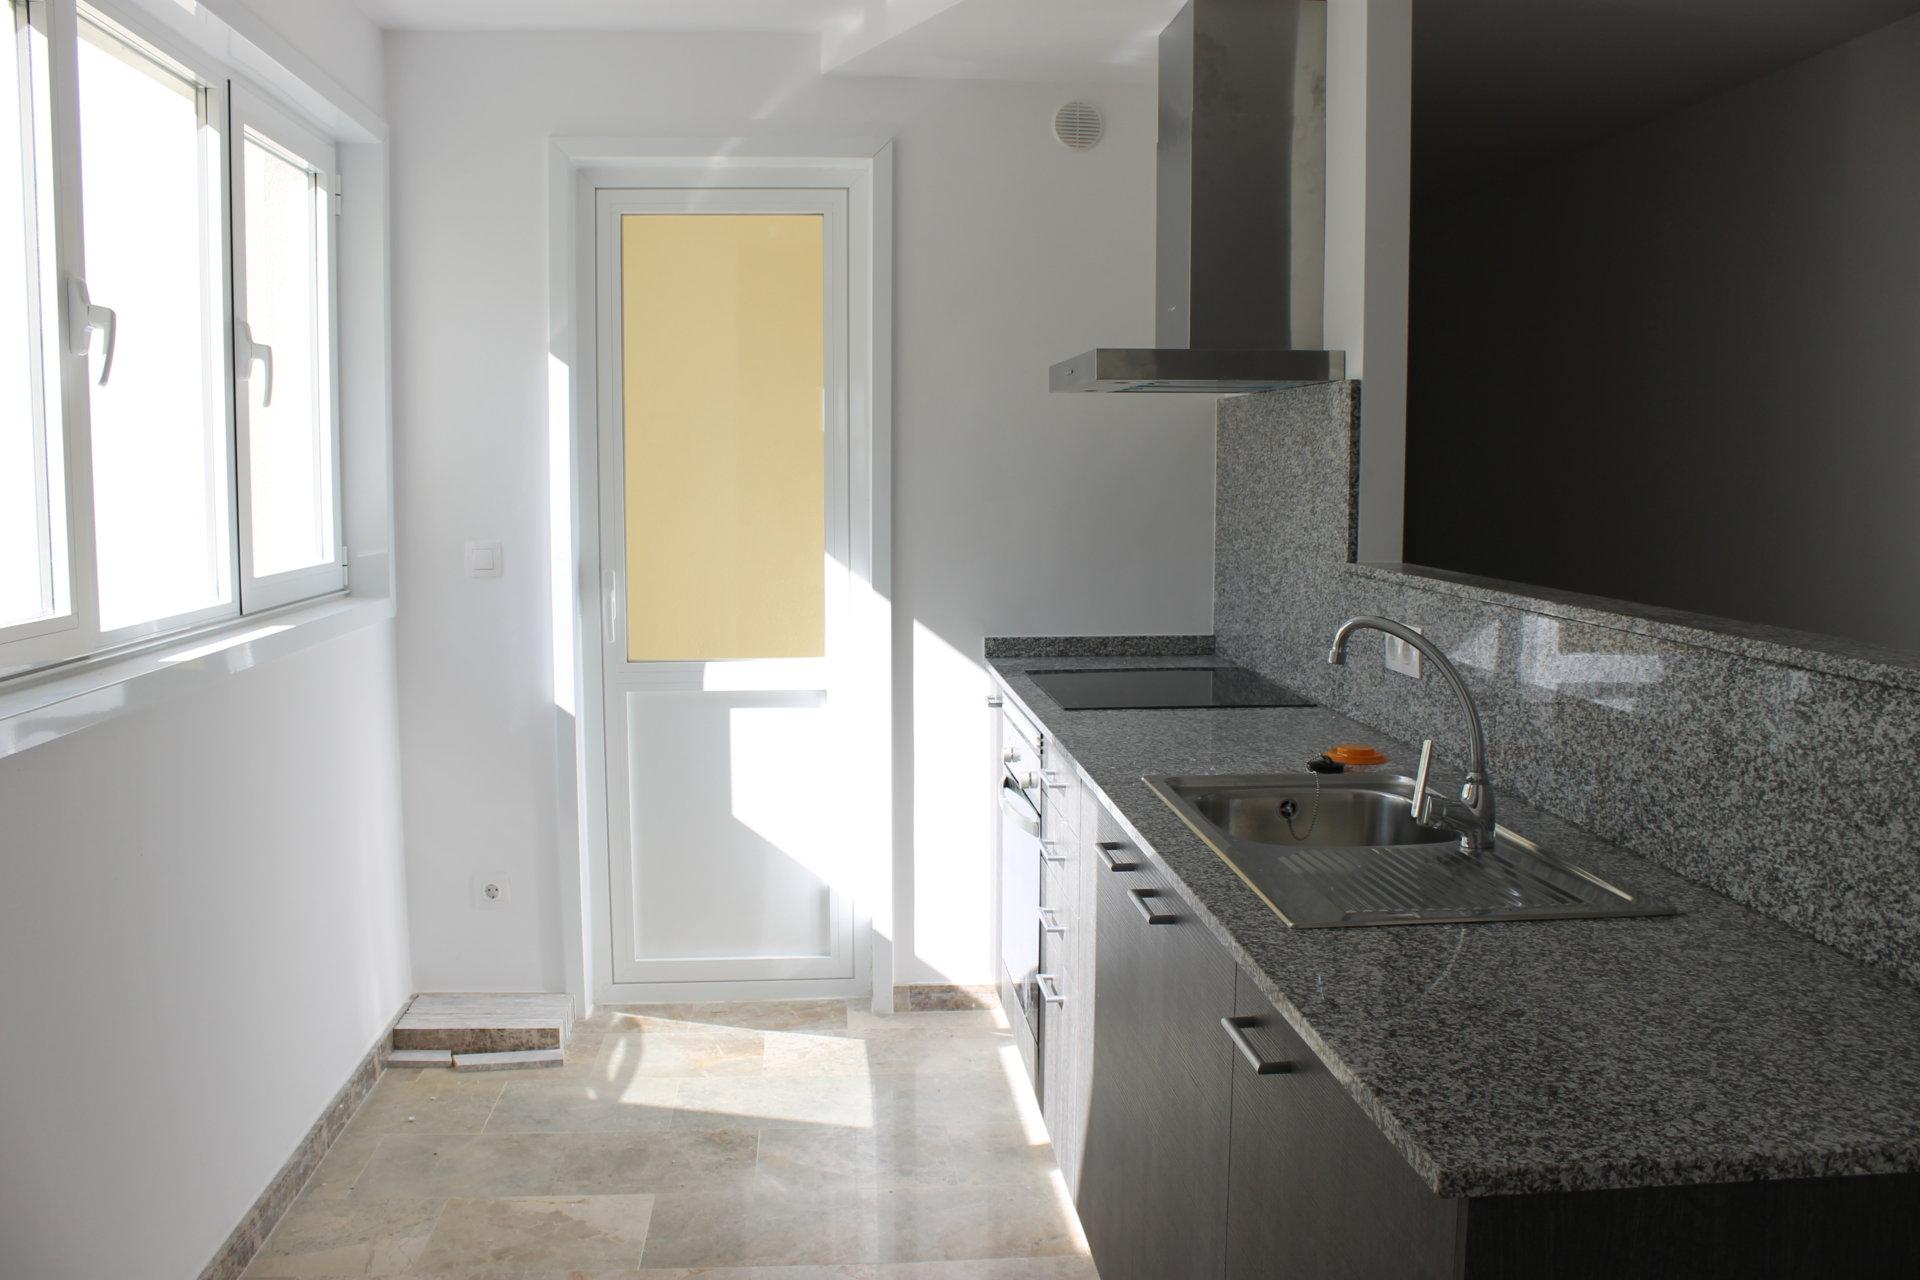 Bbva bbva vivienda casas por menos de euros - Pisos de bancos bbva ...